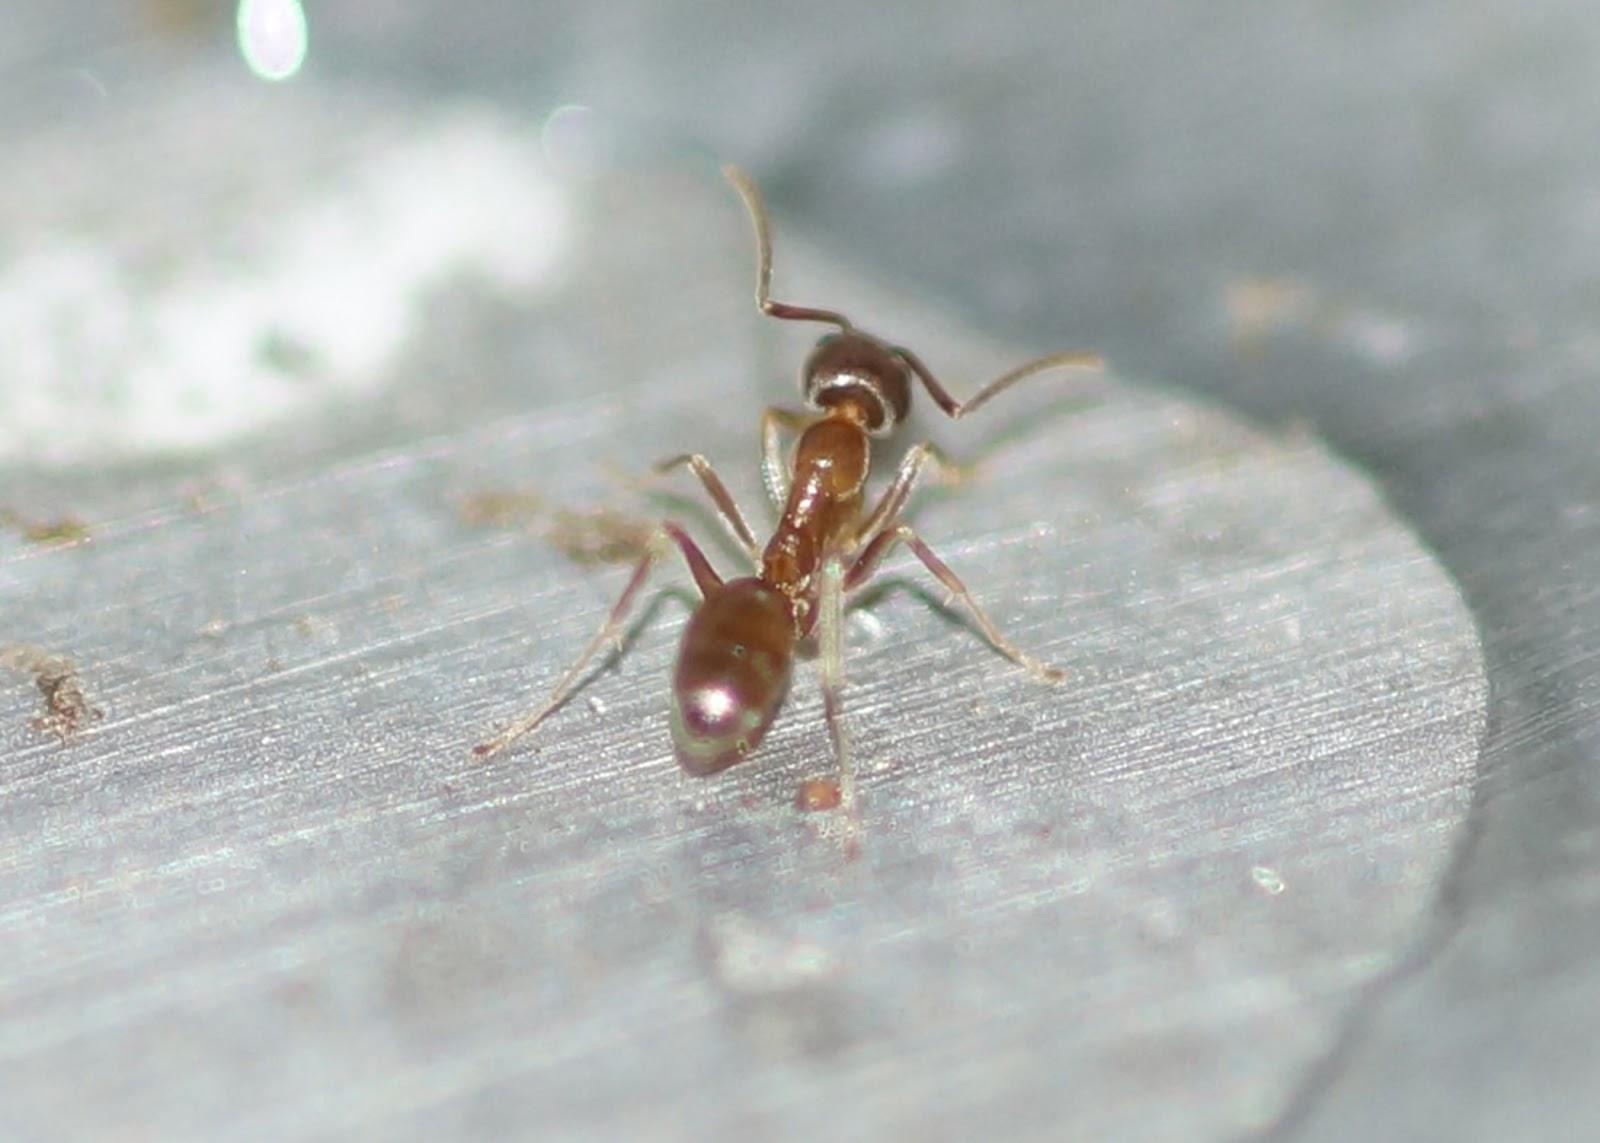 Argentine ants bite - photo#10